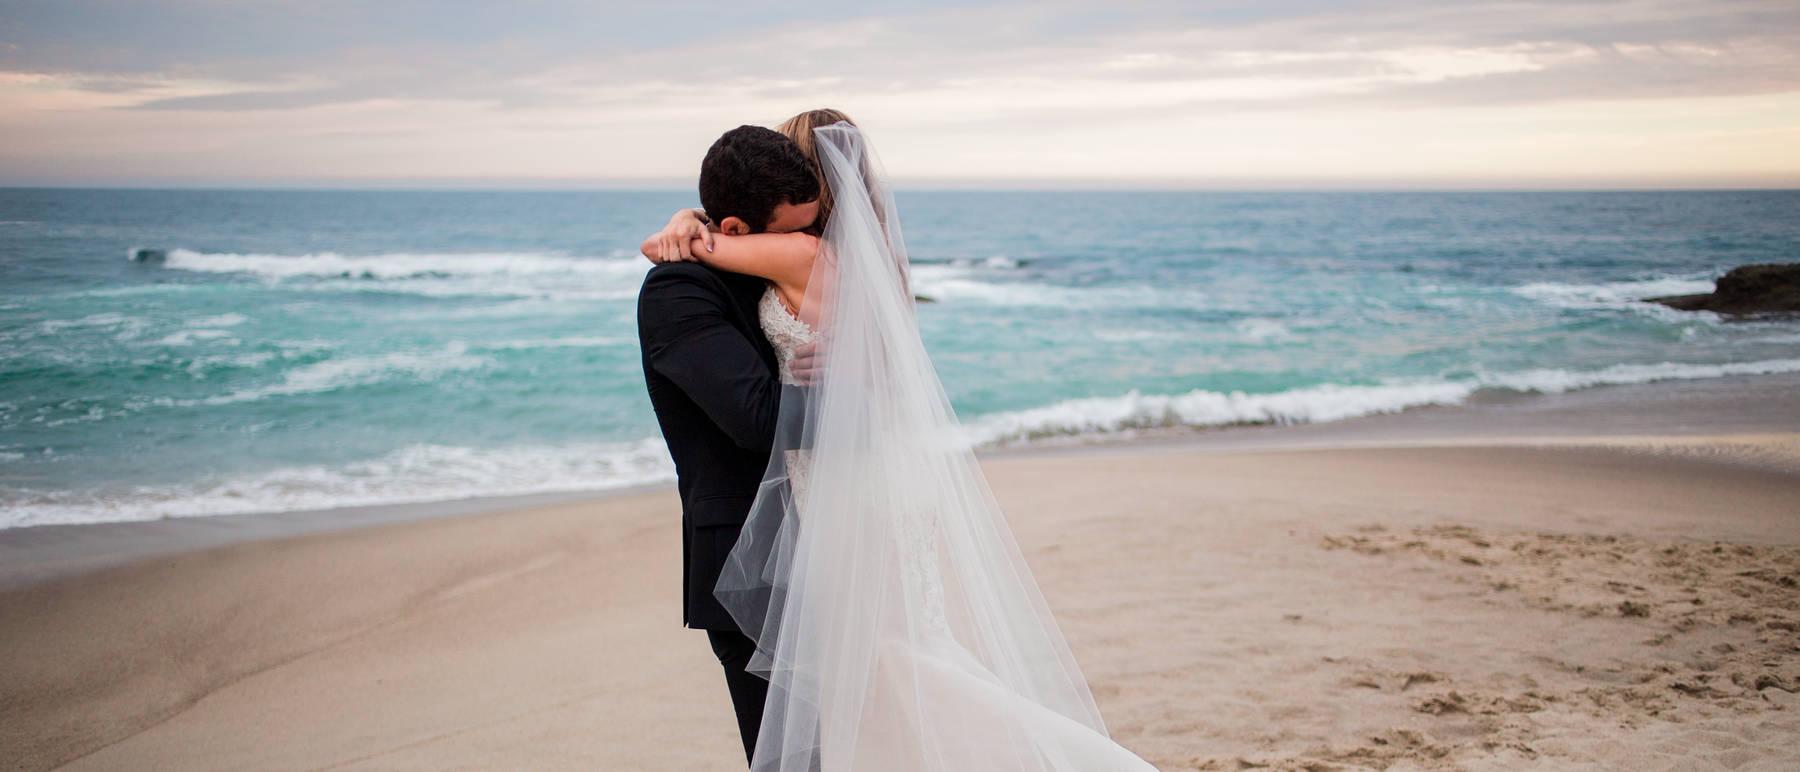 johnandjoseph-wedding-photographer-hz-slider-312